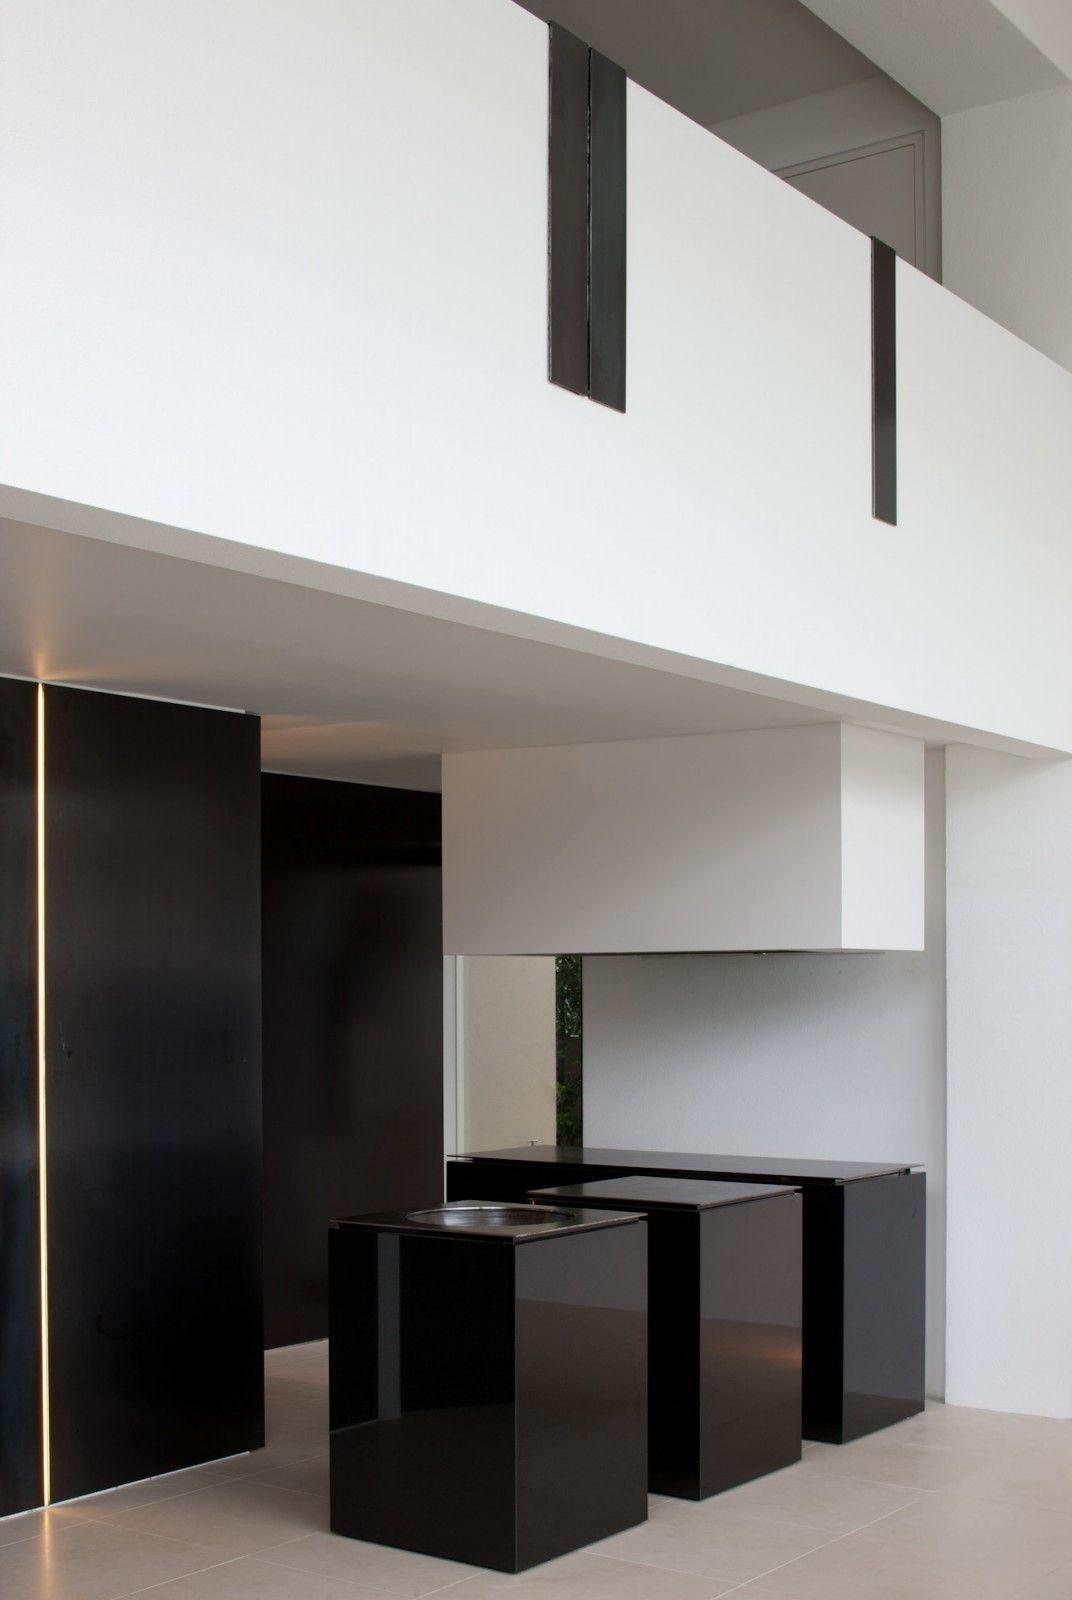 best 25 riverside residence ideas on pinterest garden led lighting australia contemporary. Black Bedroom Furniture Sets. Home Design Ideas